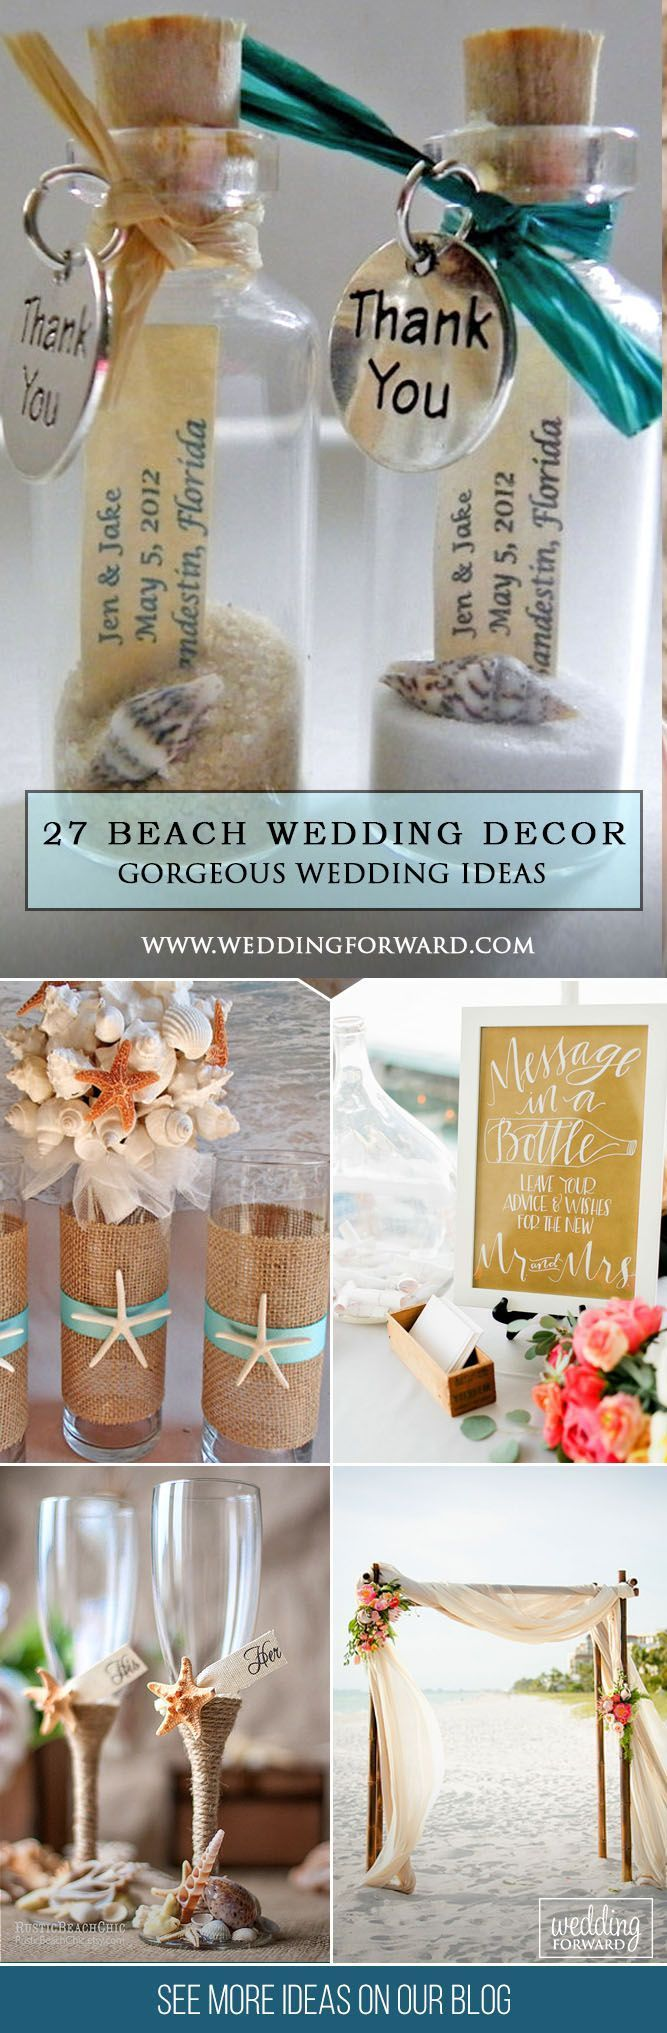 Gorgeous Beach Wedding Decoration Ideas  Beach weddings donut